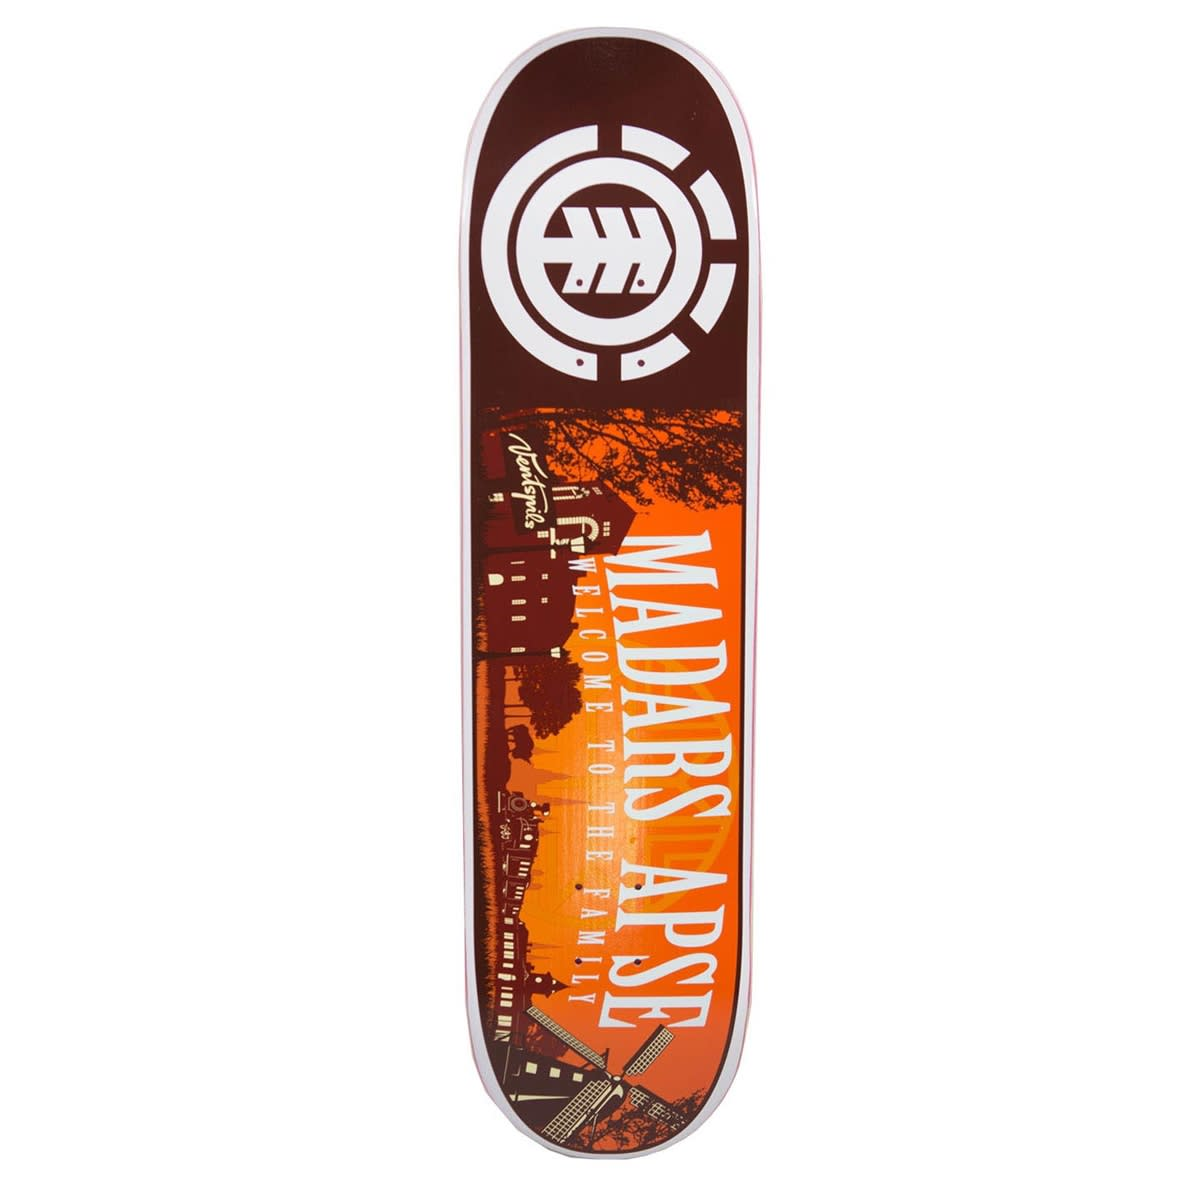 Skateboard Uses: Element Madars Welcome Skateboard Deck